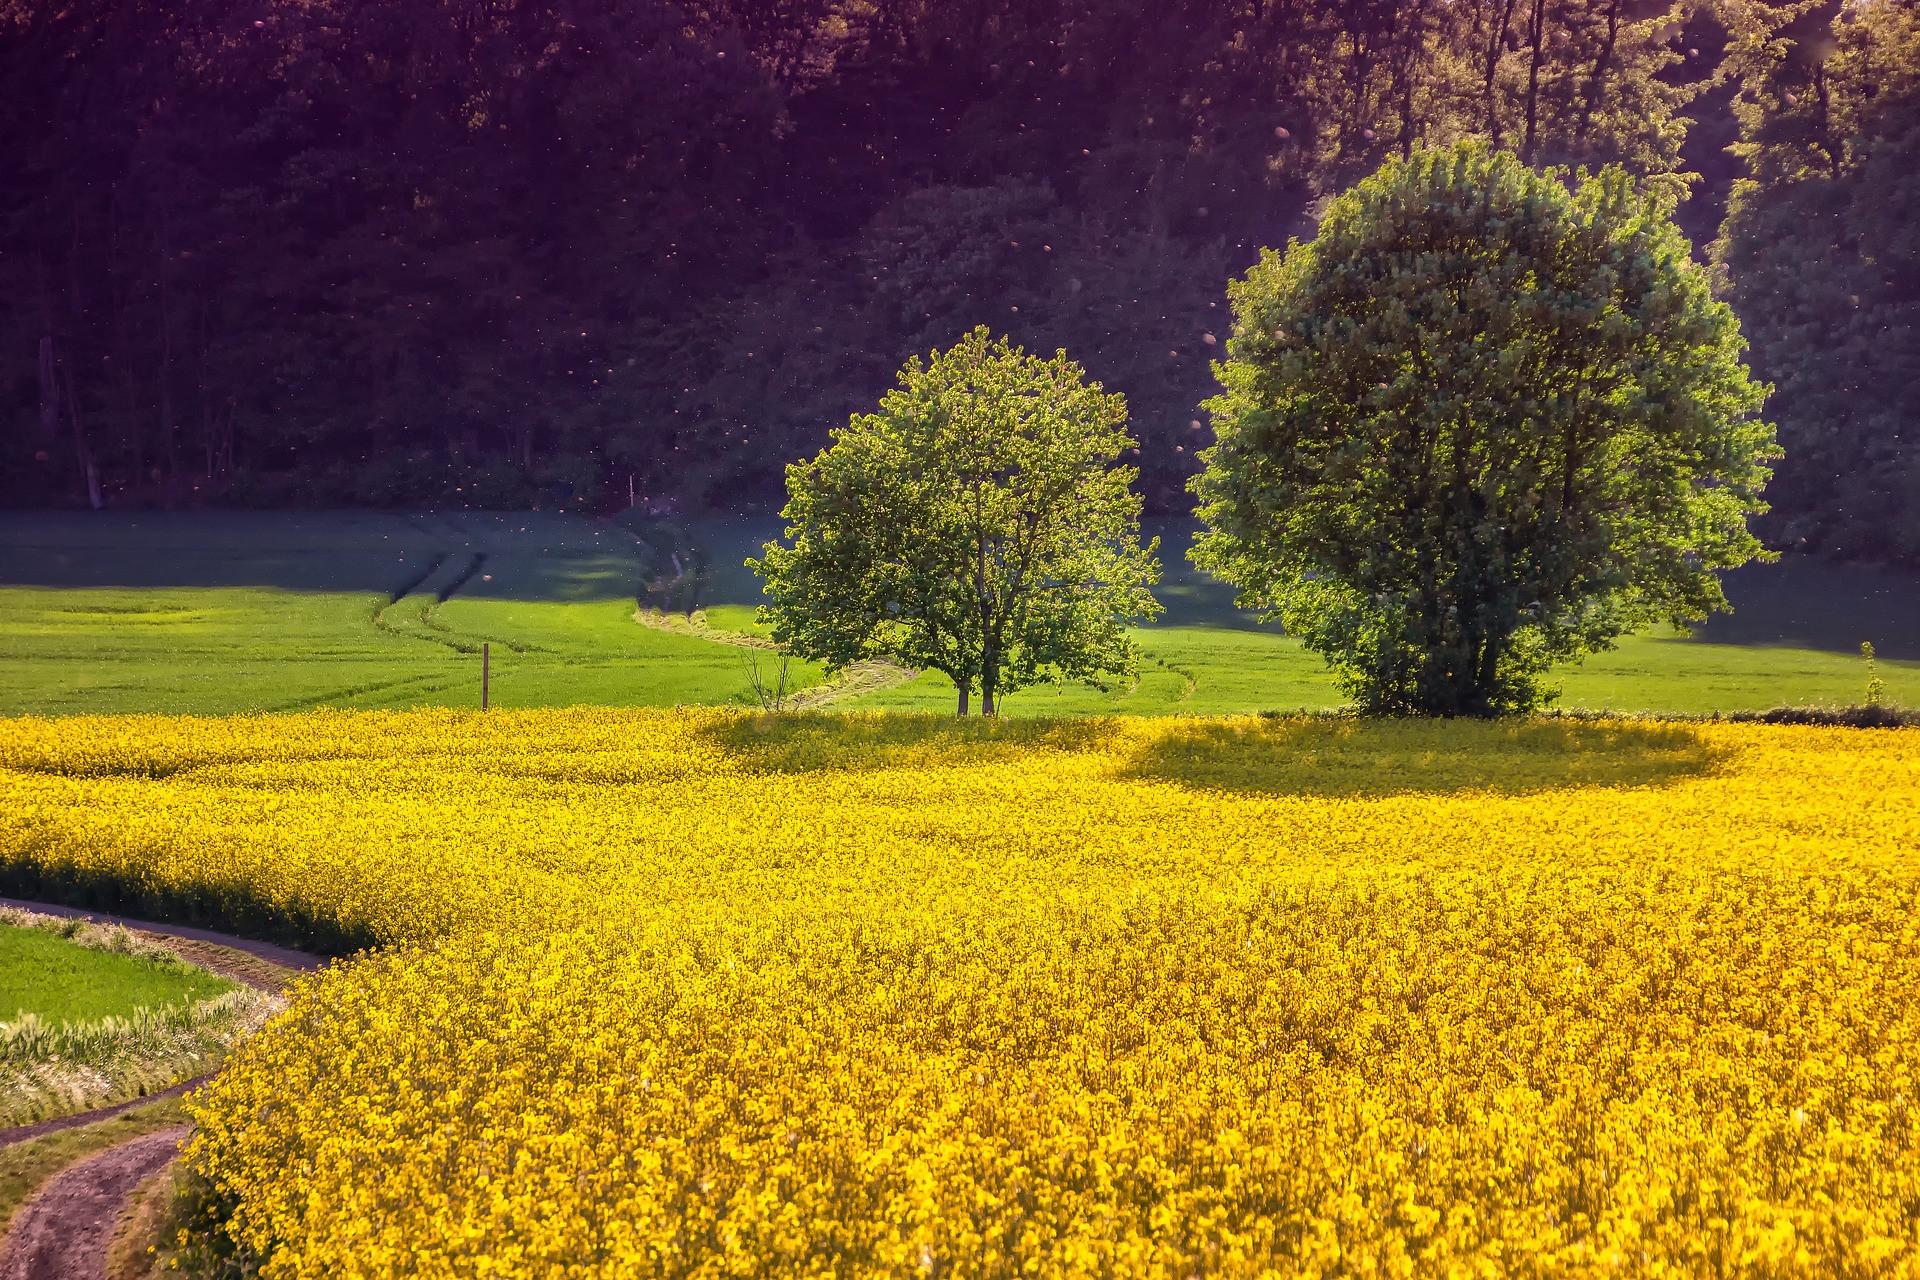 landscape-3427990_1920.jpg